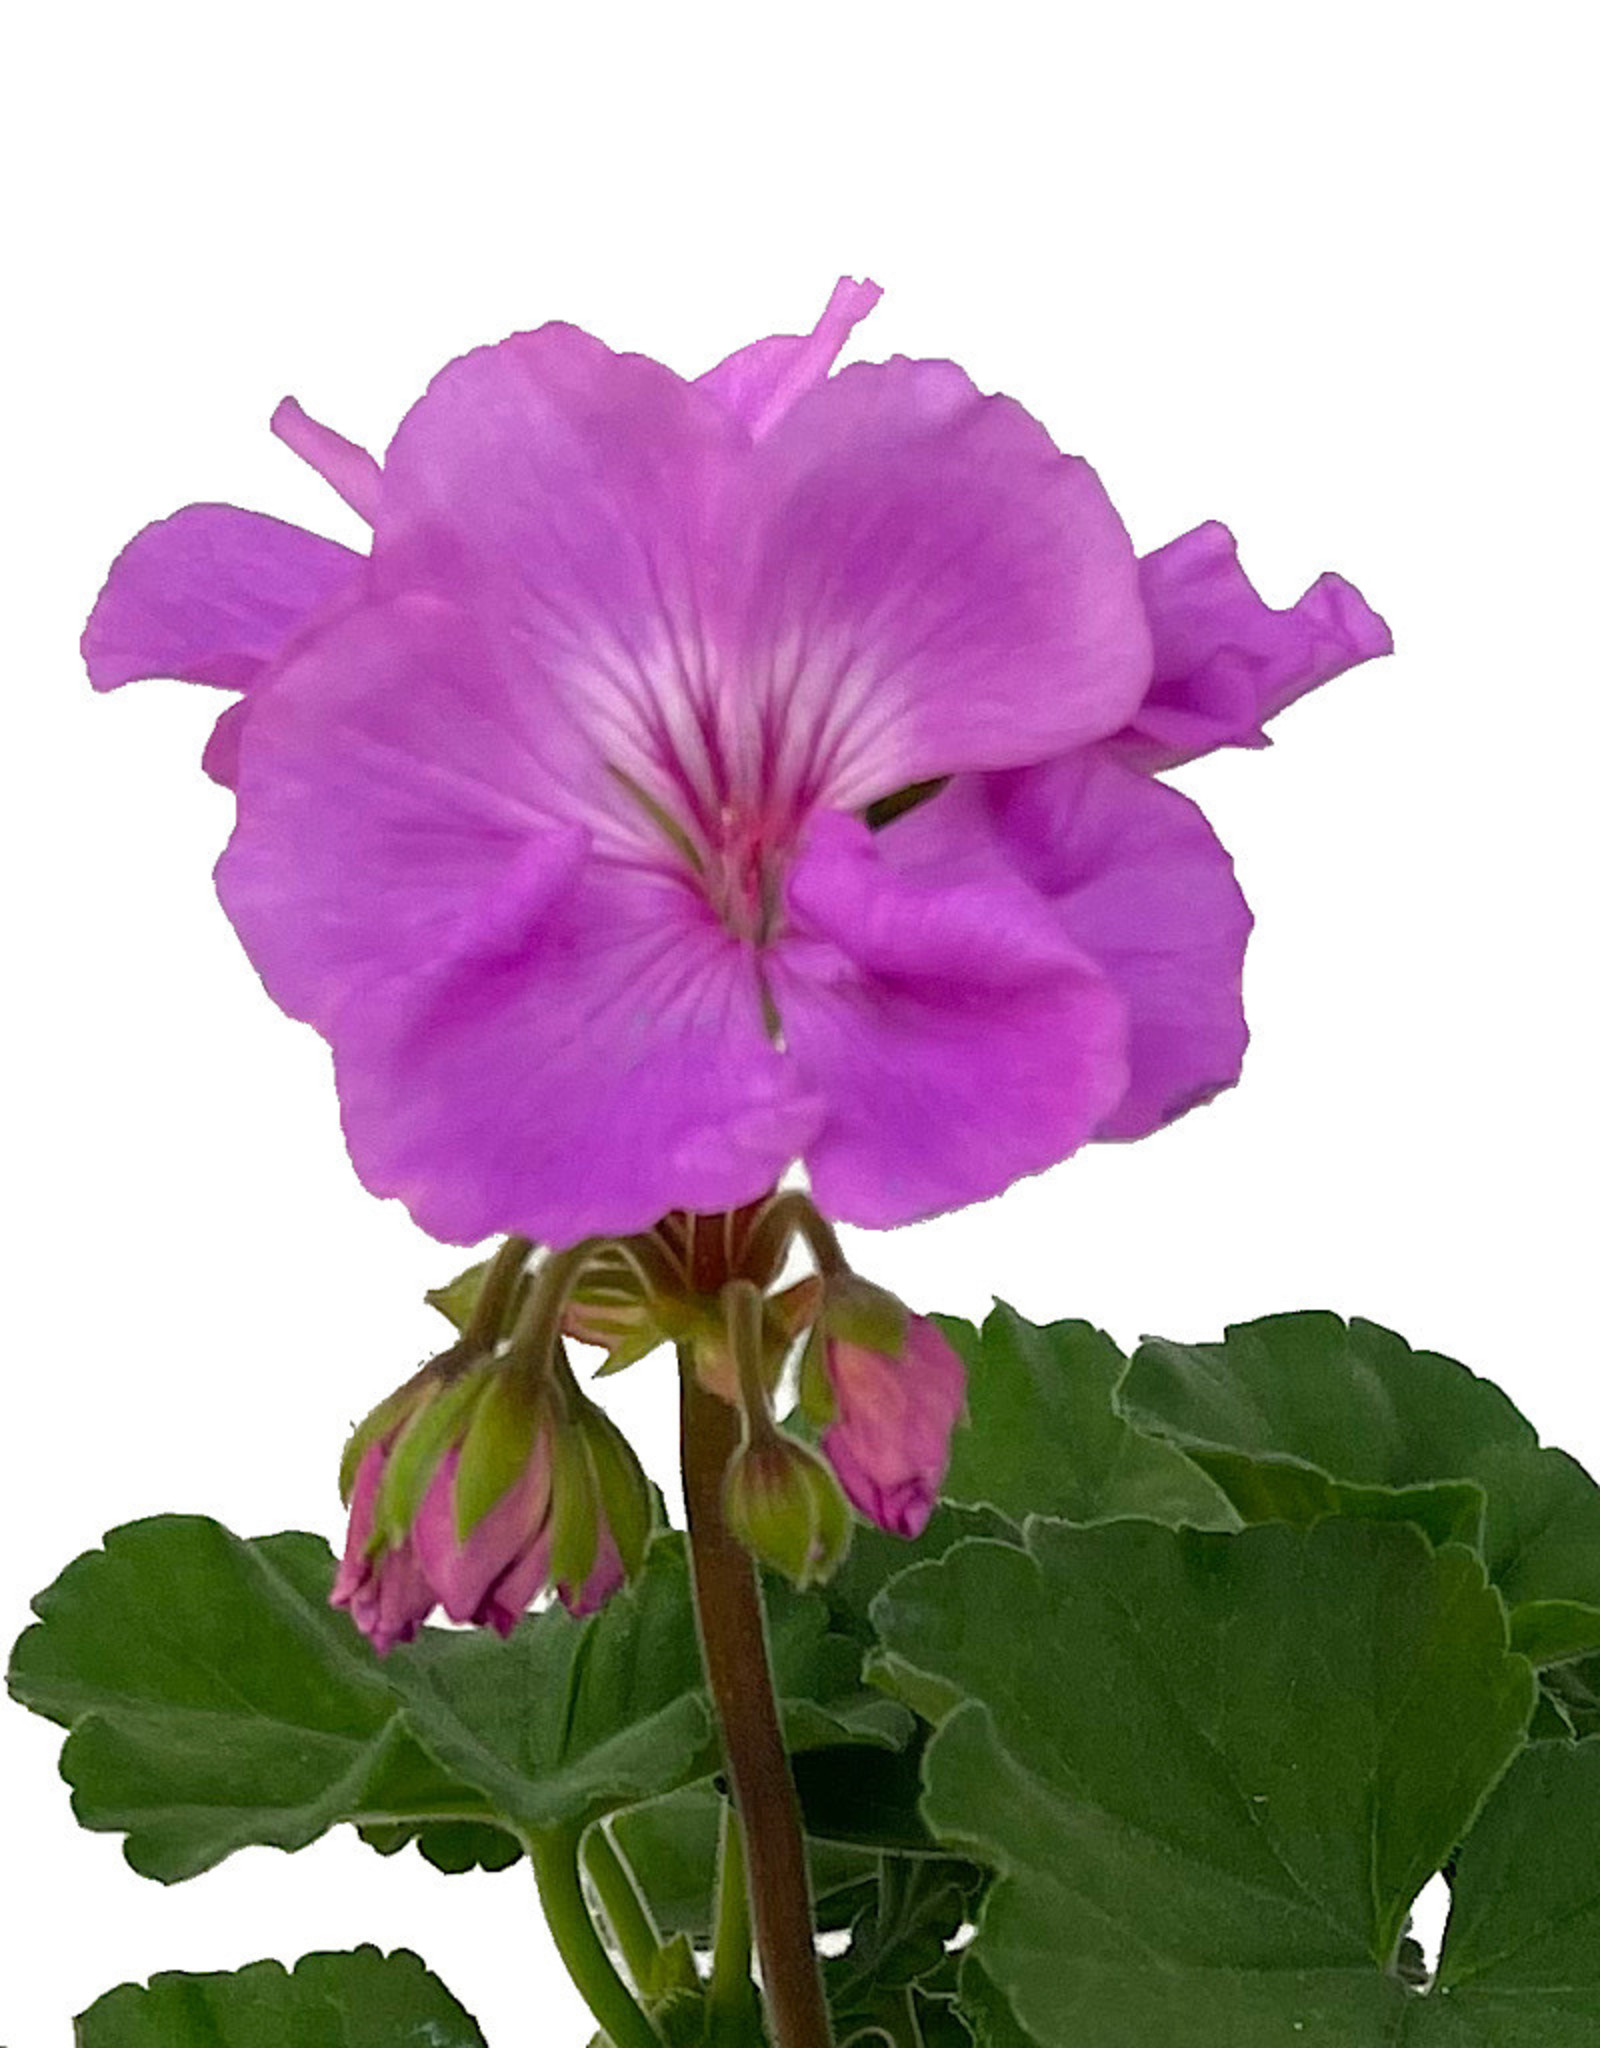 Geranium Zonal 'Moonlight Lavender Evolution' 5 Inch